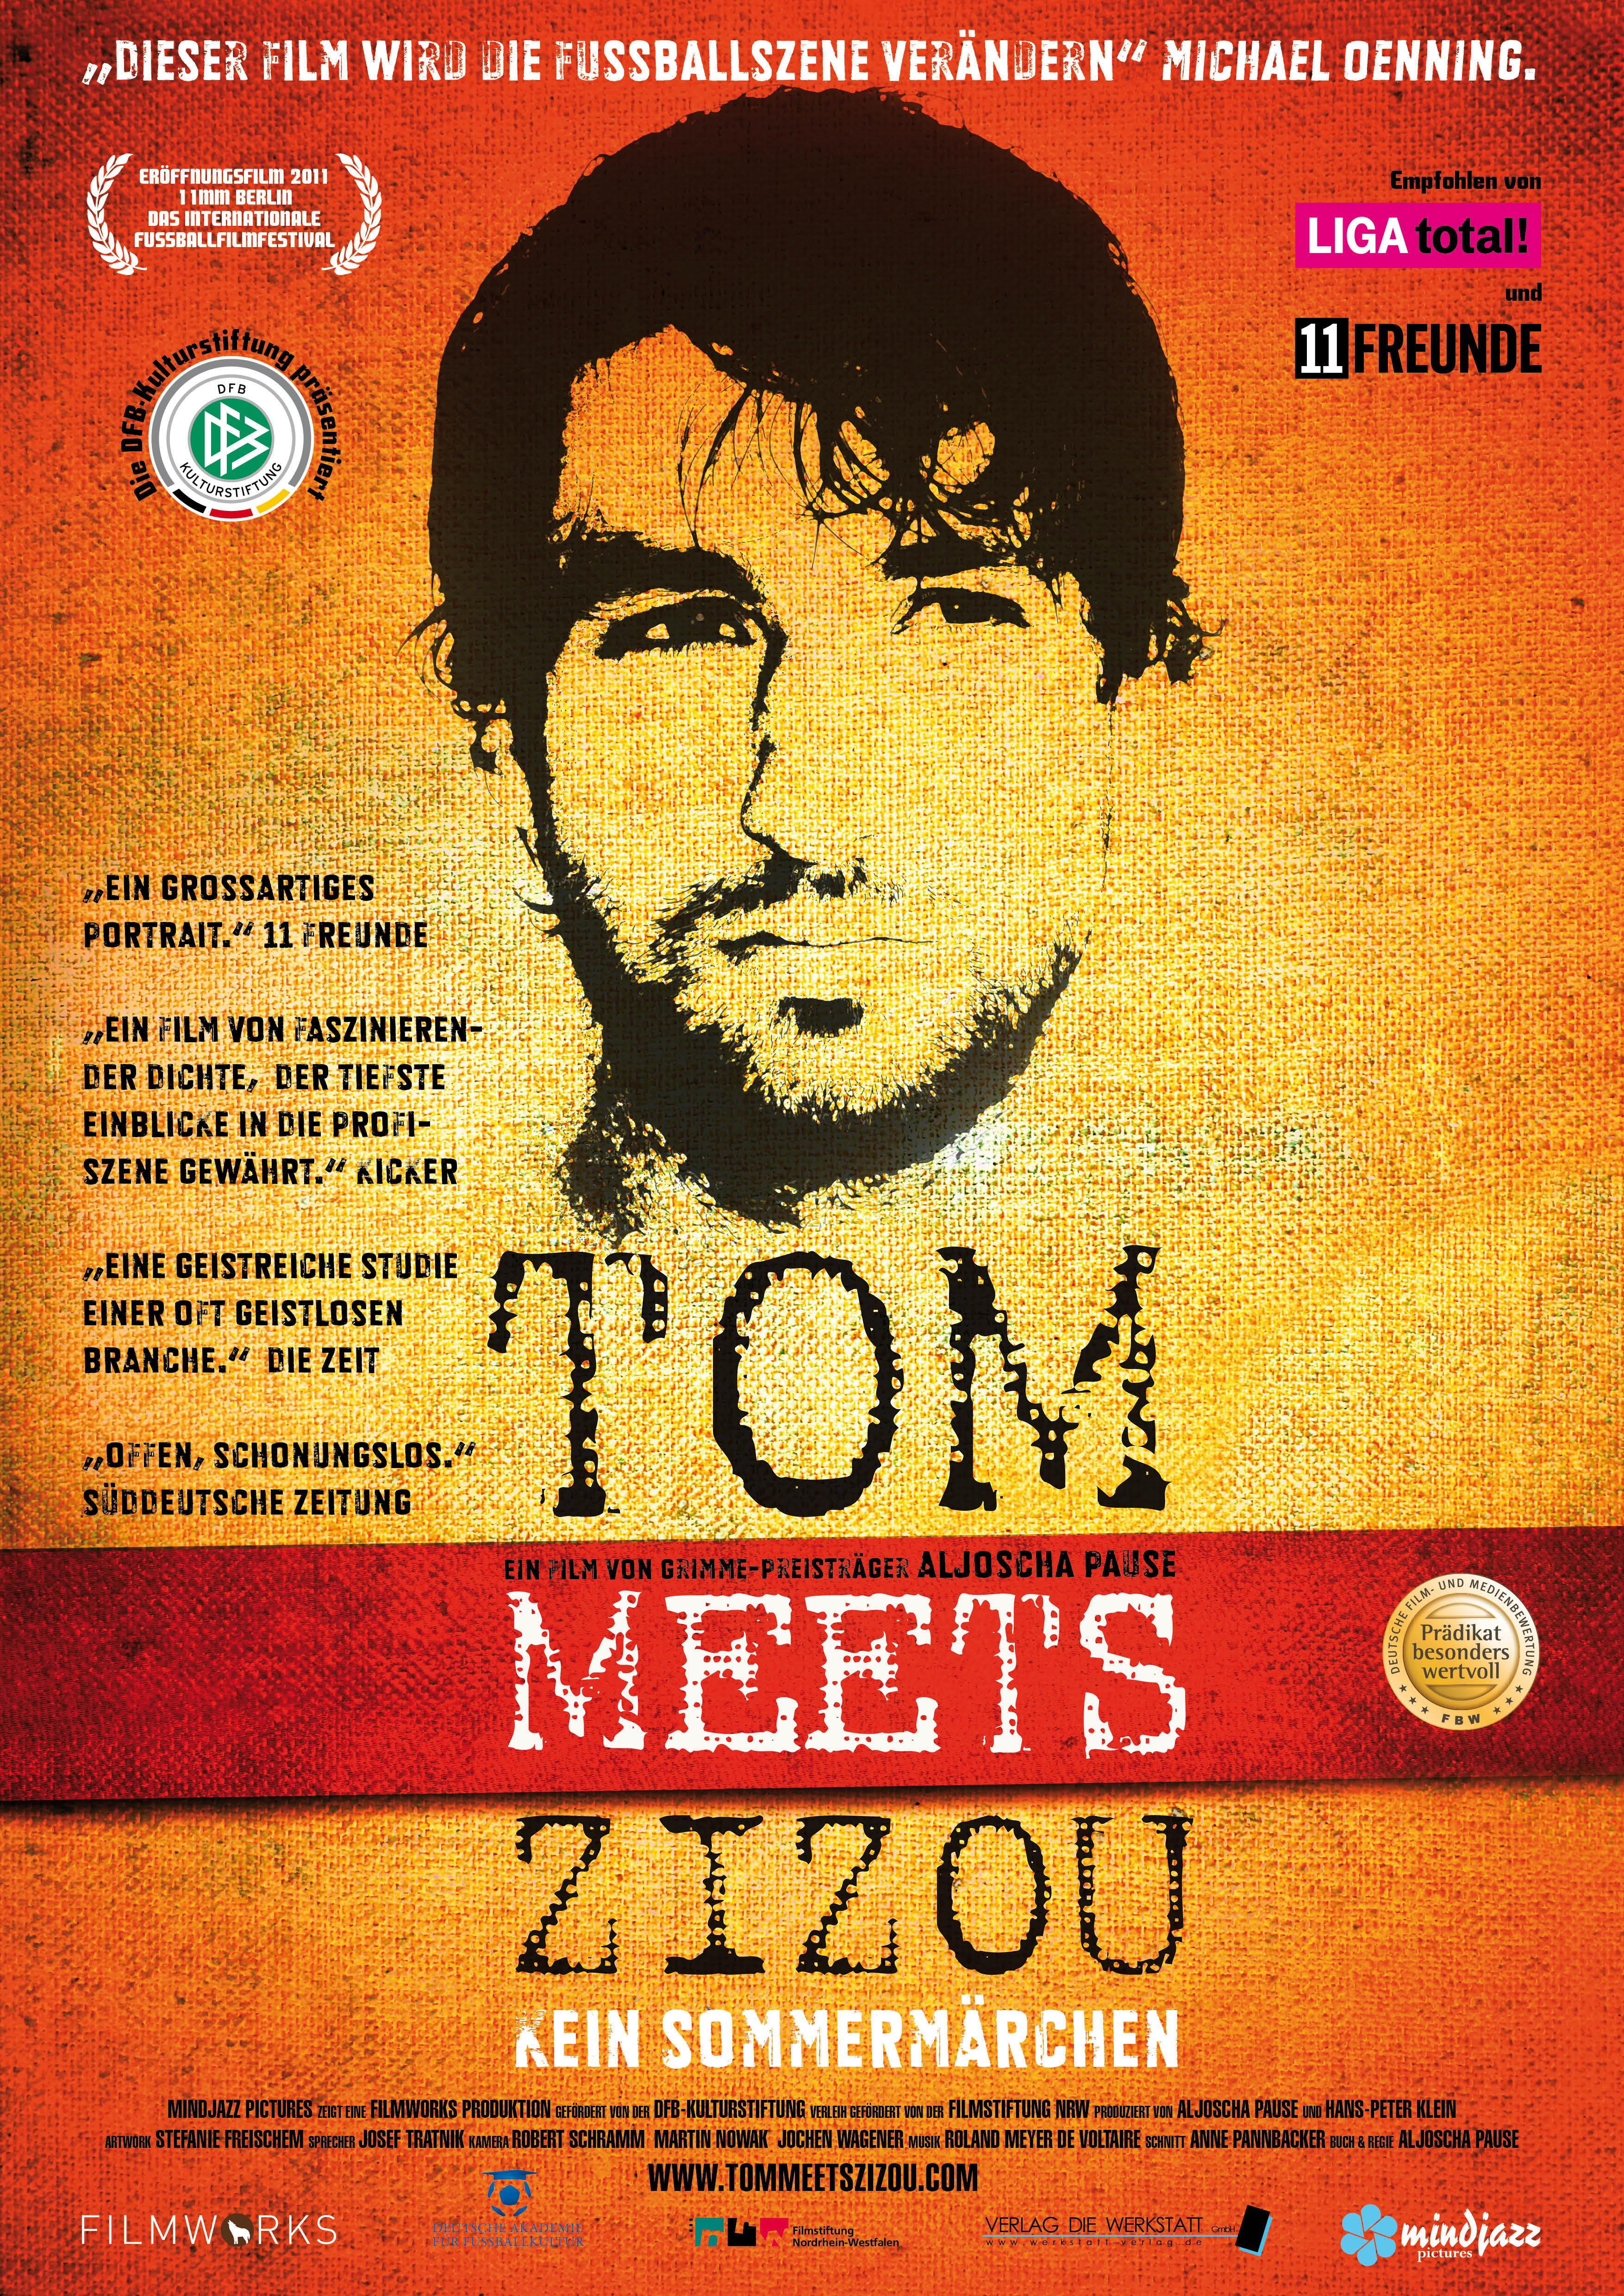 Tom Meets Zizou Kein Sommermarchen Wikipedia